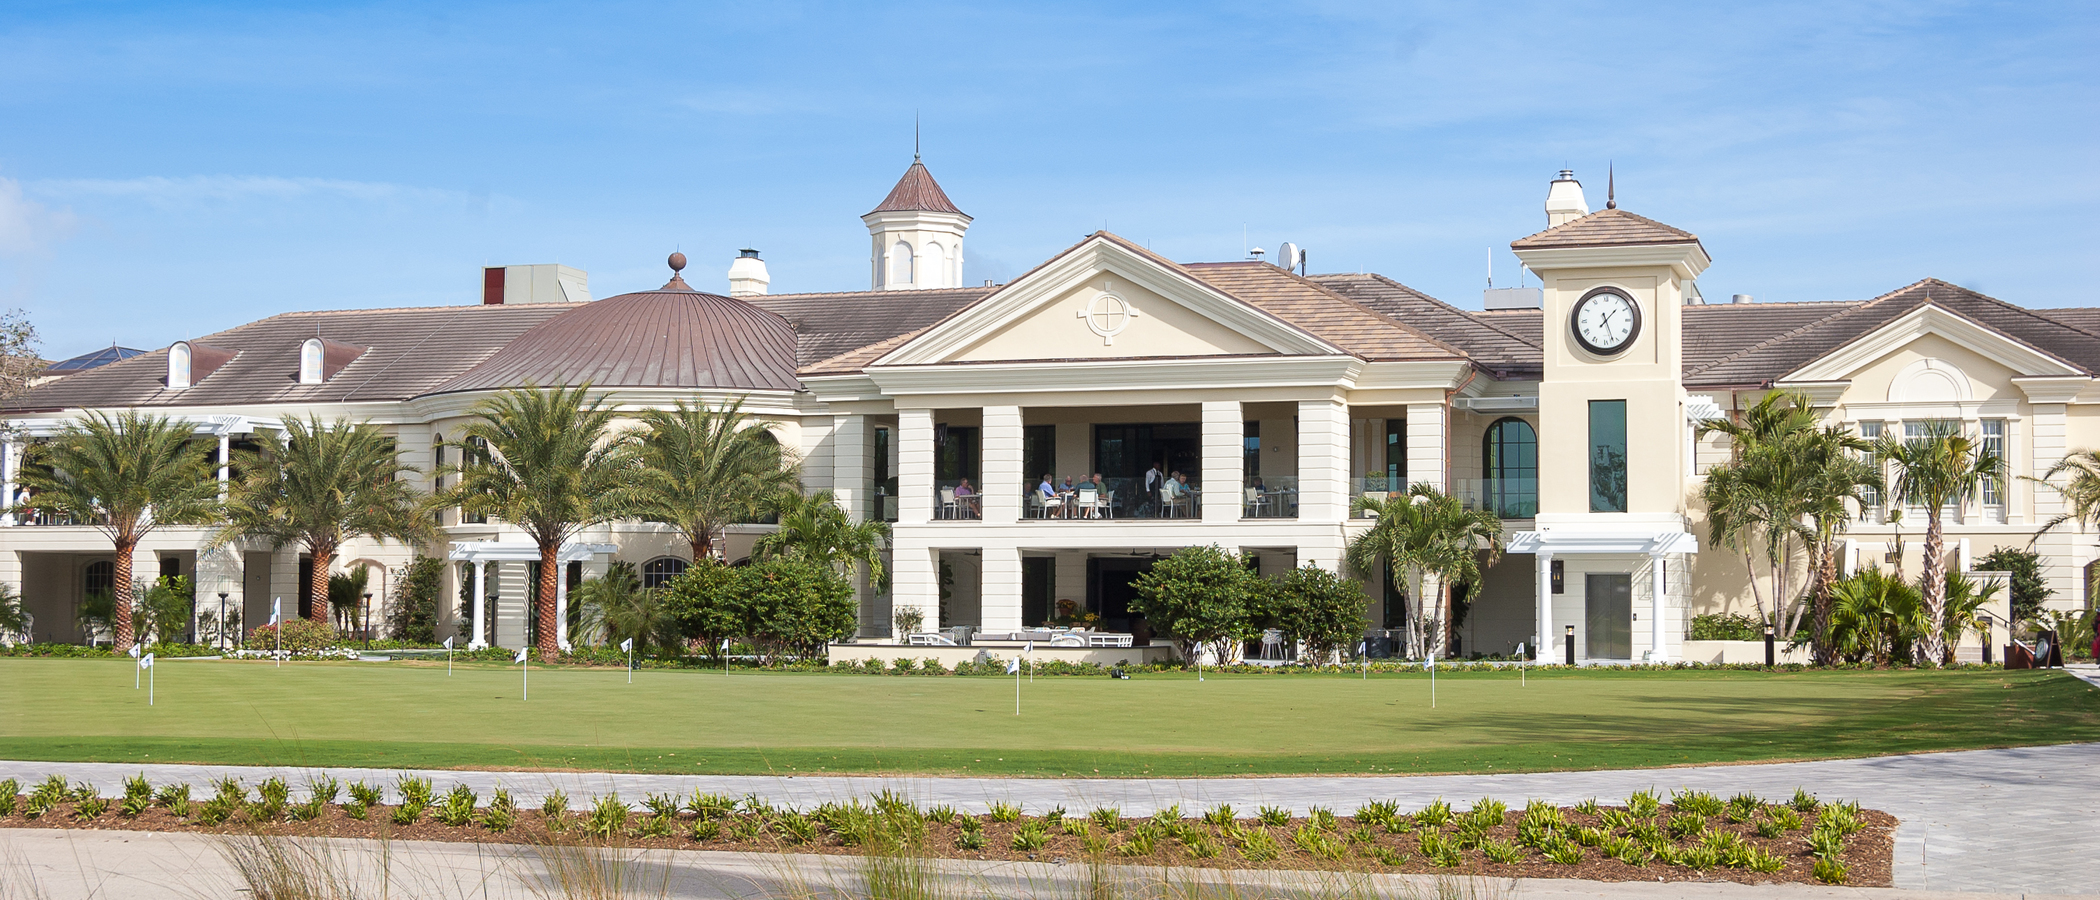 John's Island Real Estate Company | Exclusively John's